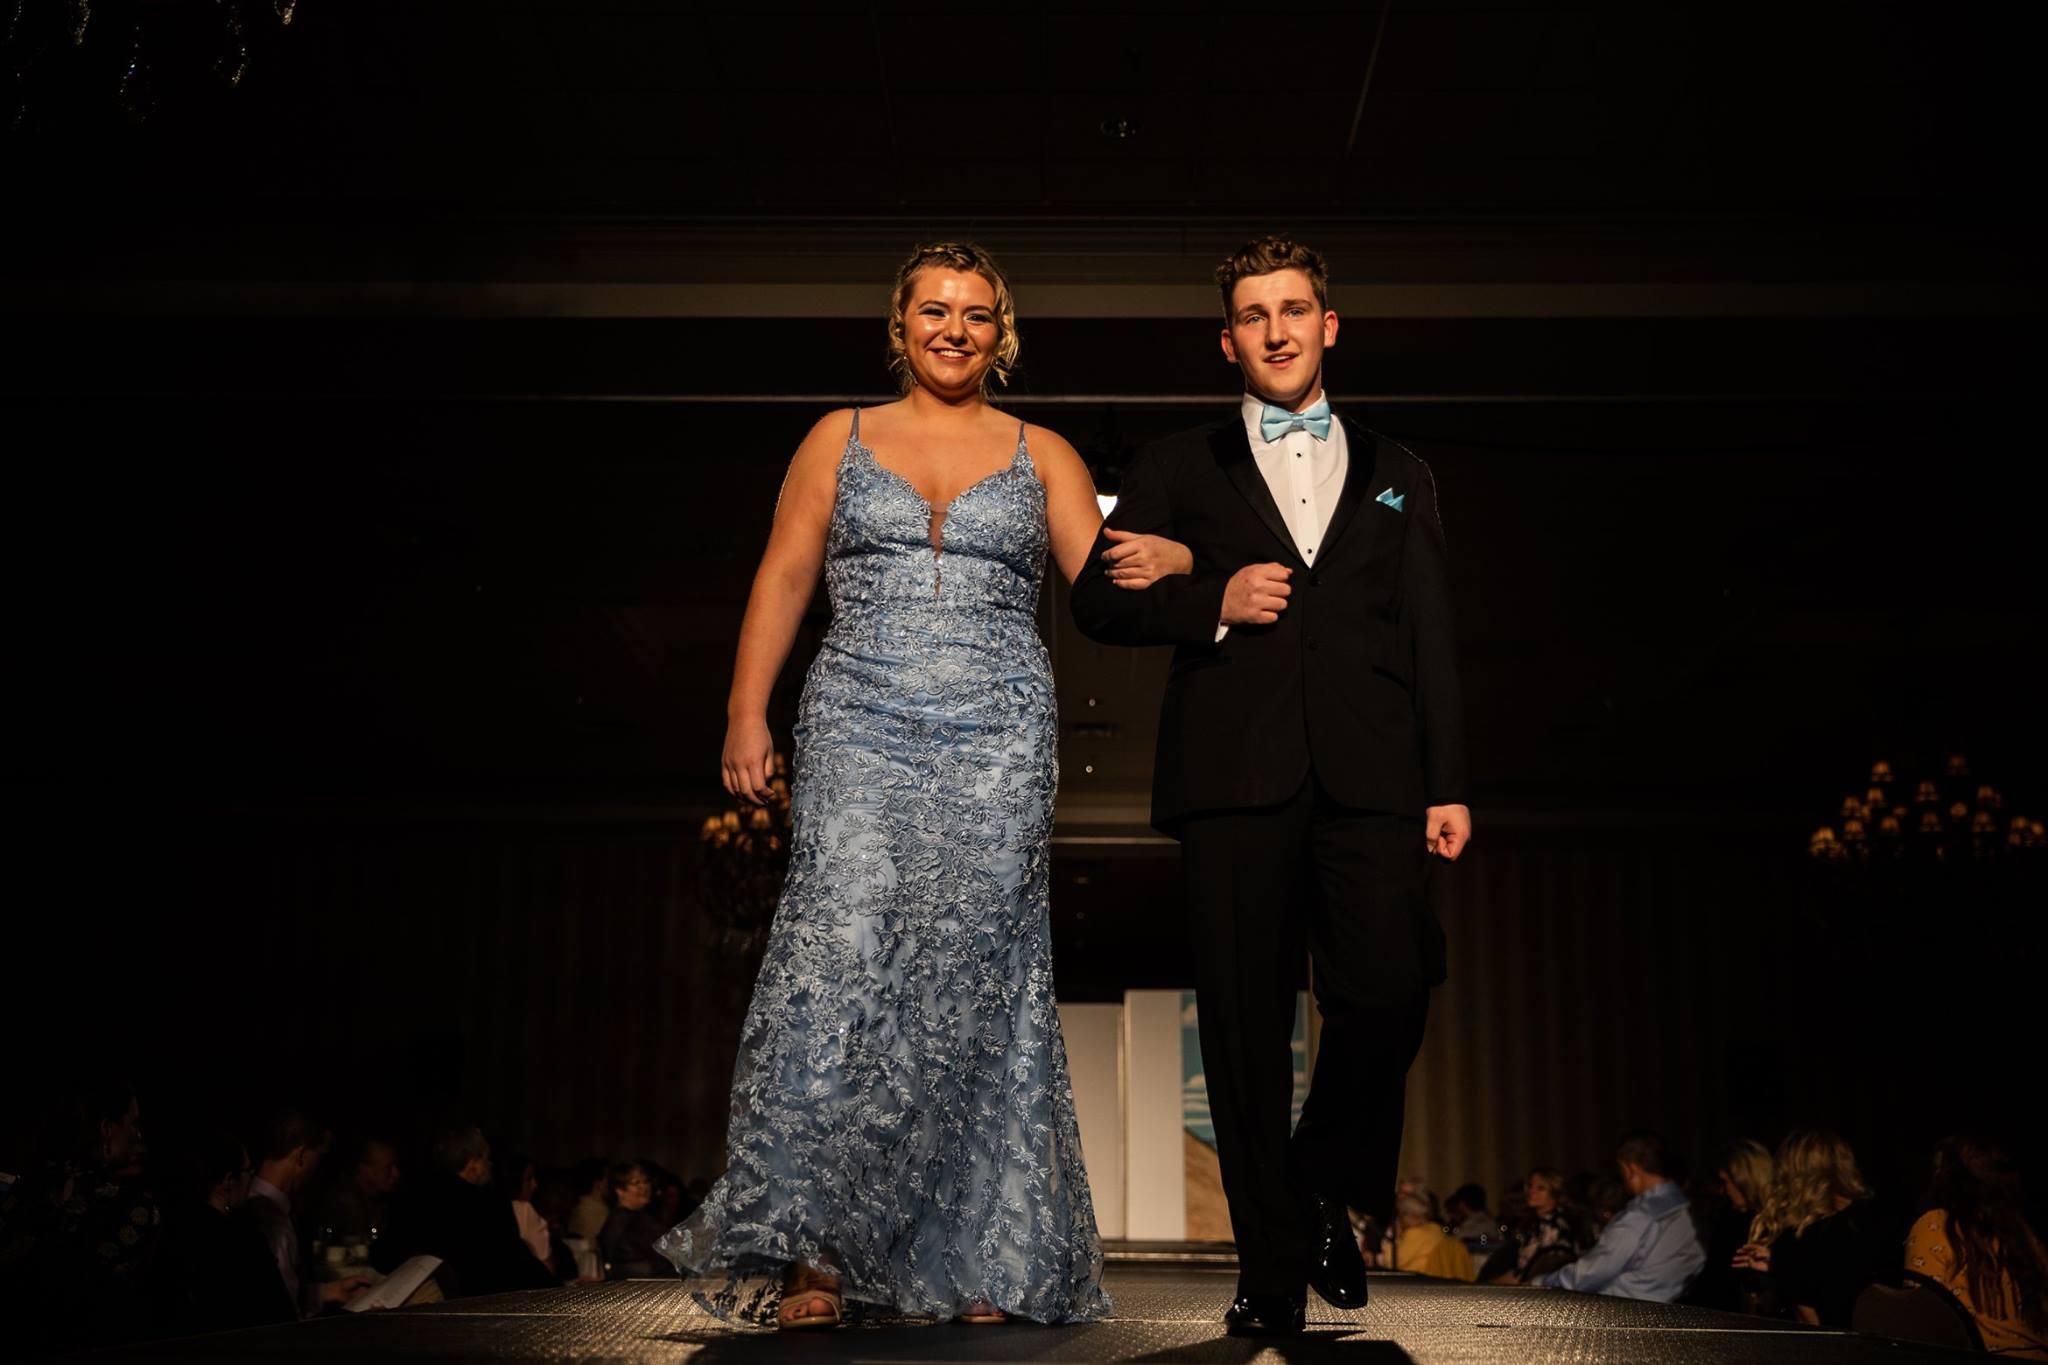 Lutheran_North_High_School_Macomb_Michigan_LHN_Fashion_Show_2019_Seniors (1).jpg